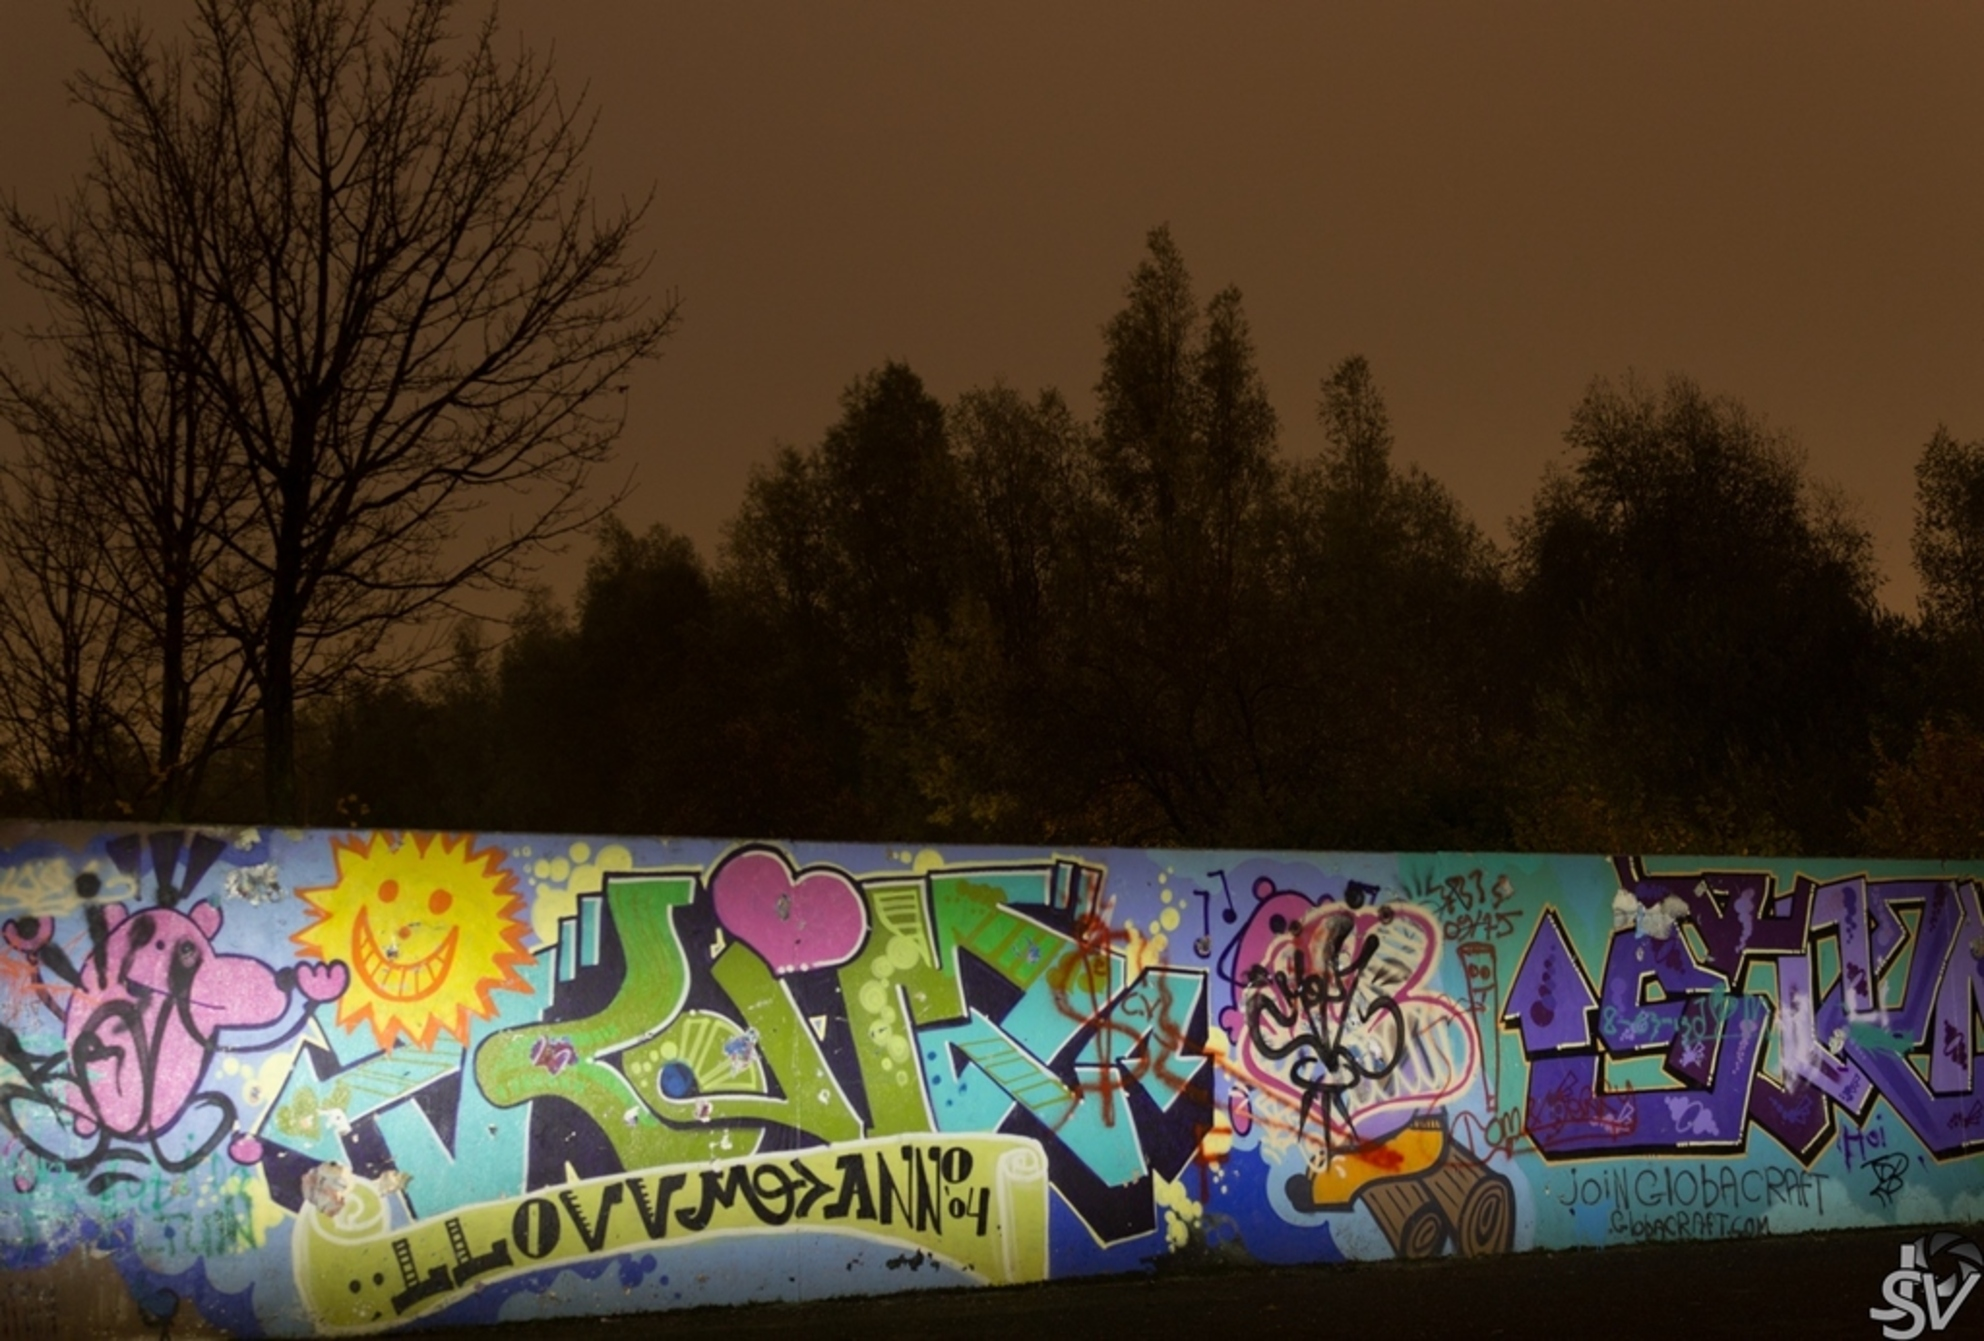 Graffiti - Canon EOS 600D EF-S 18-55mm IS II  Experimentje bij nacht - foto door JSV24 op 17-11-2013 - deze foto bevat: canon, nacht, graffiti, muur, eos, 600D